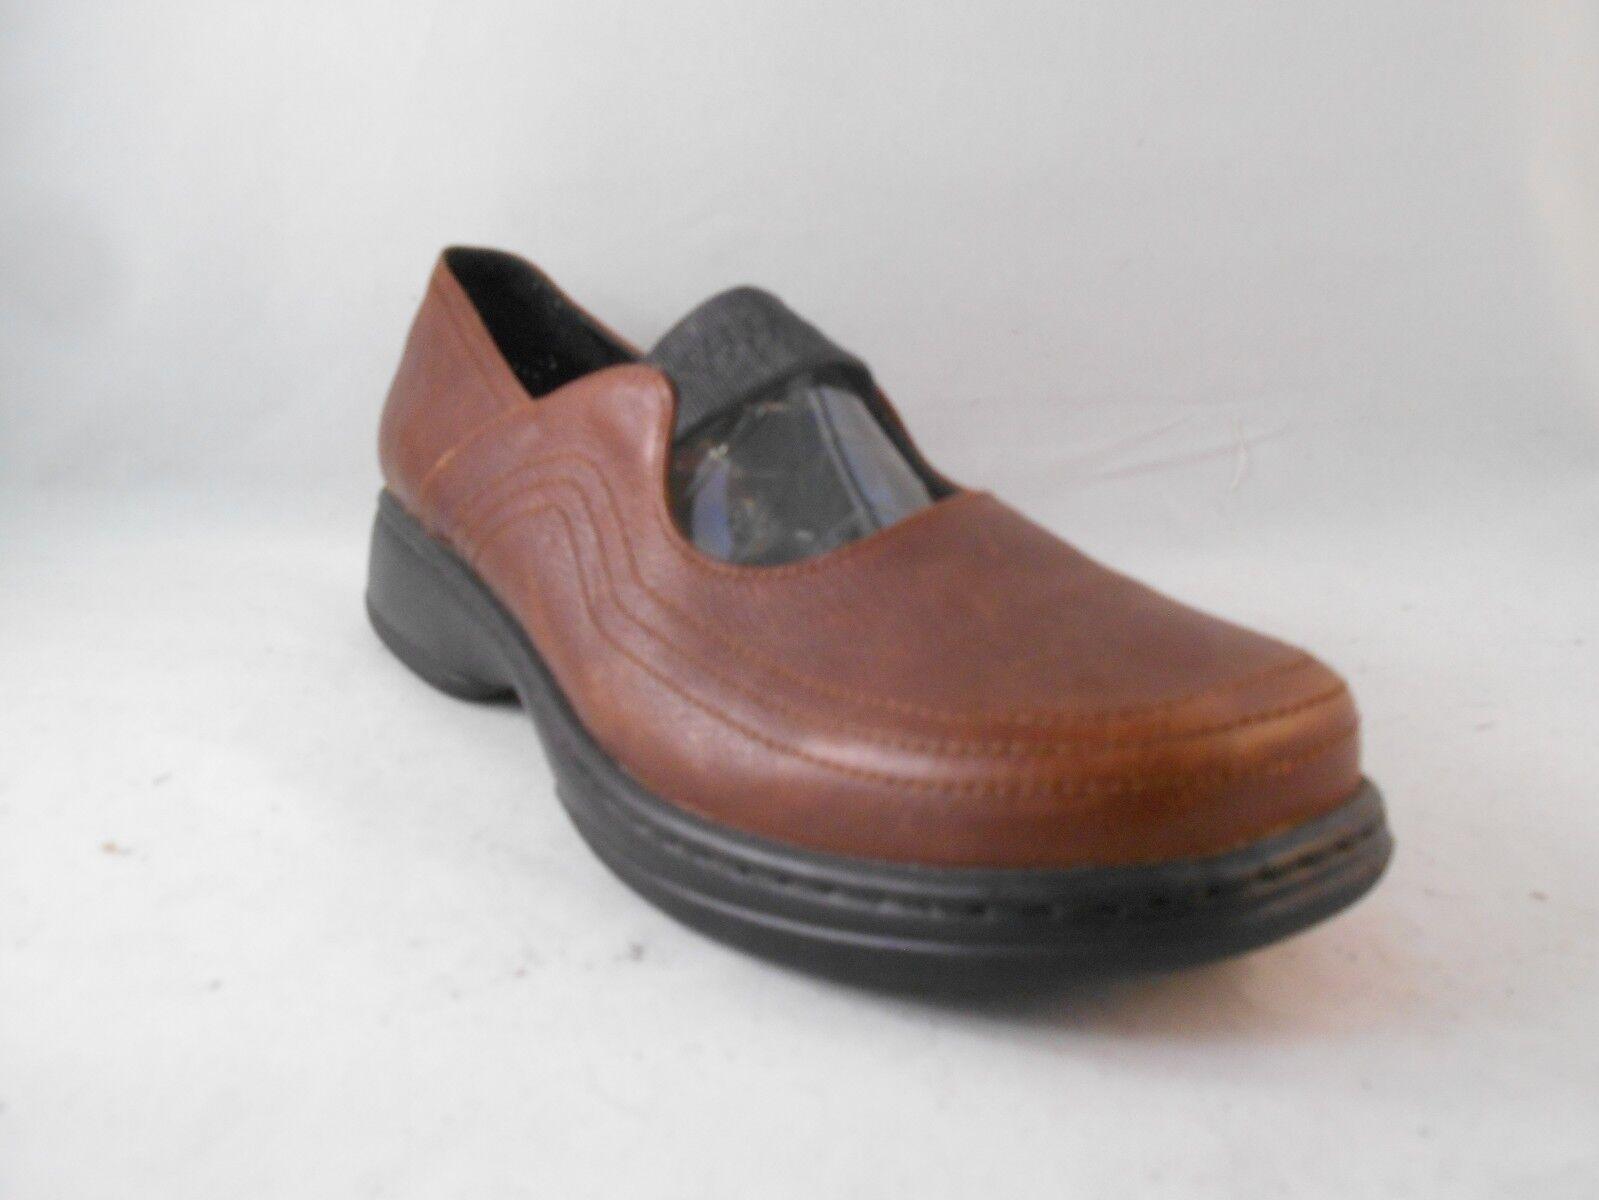 Dansko Marroneee Leather Mary Janes w  Elastic Clogs Wmn's Sz 11.5 - 12 ; 42 EUR